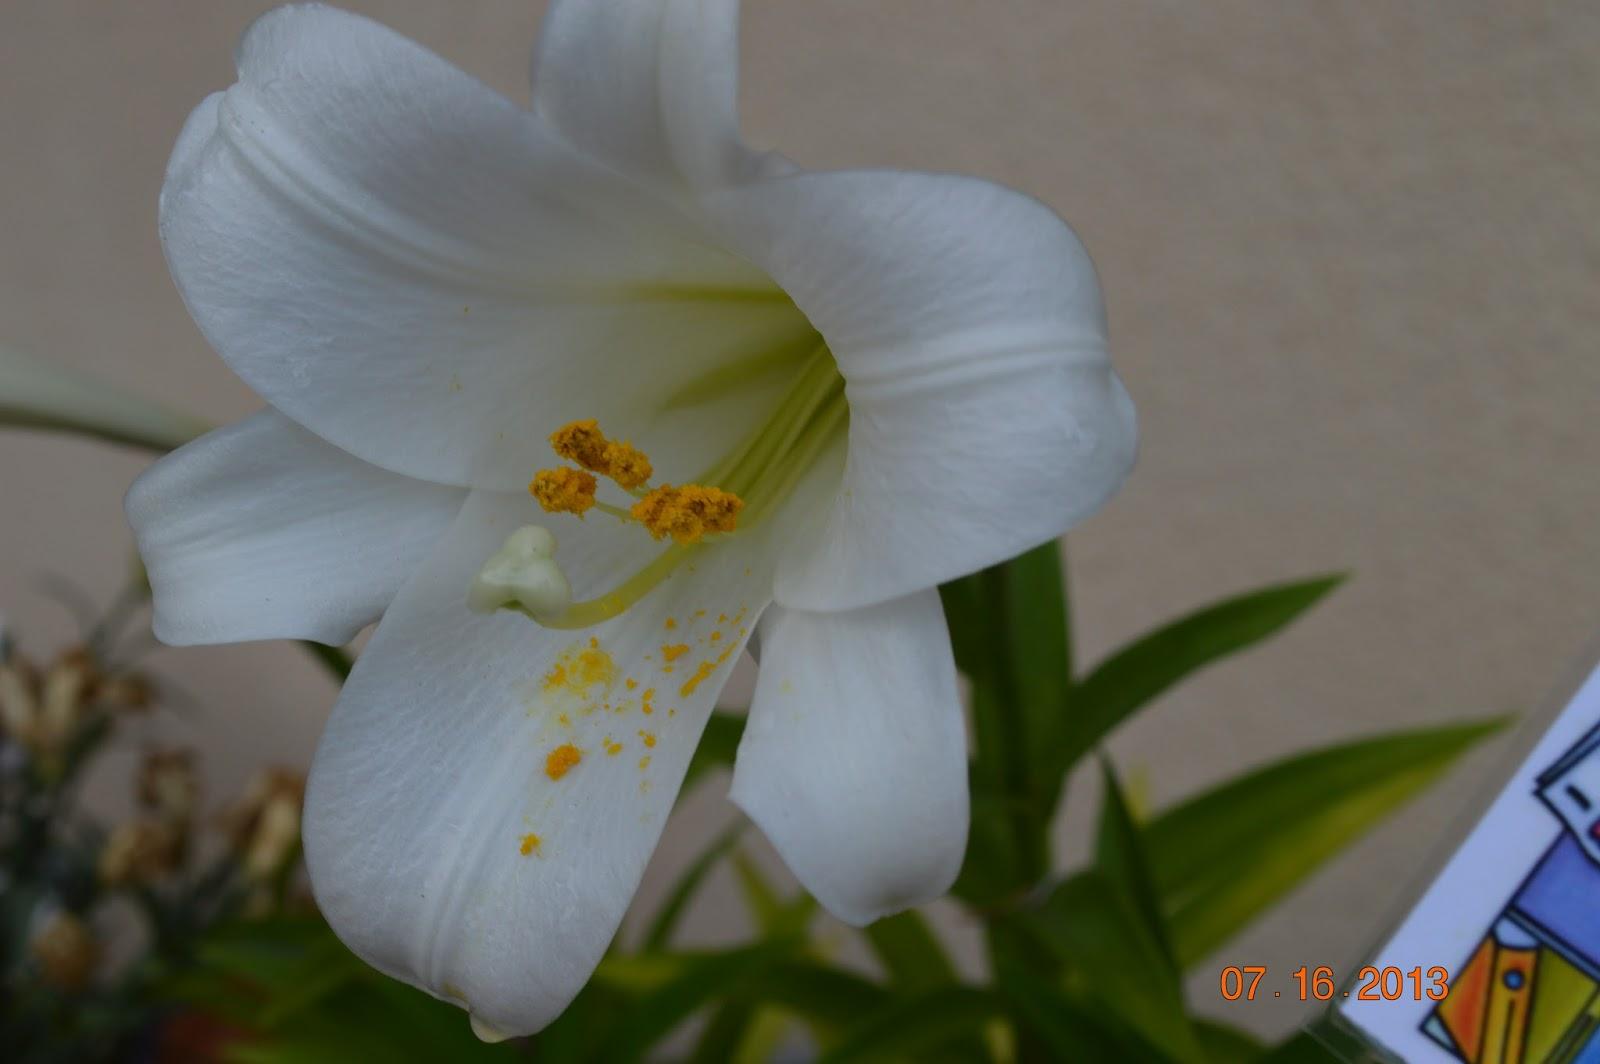 Pollen & Still Life - Looking Glass